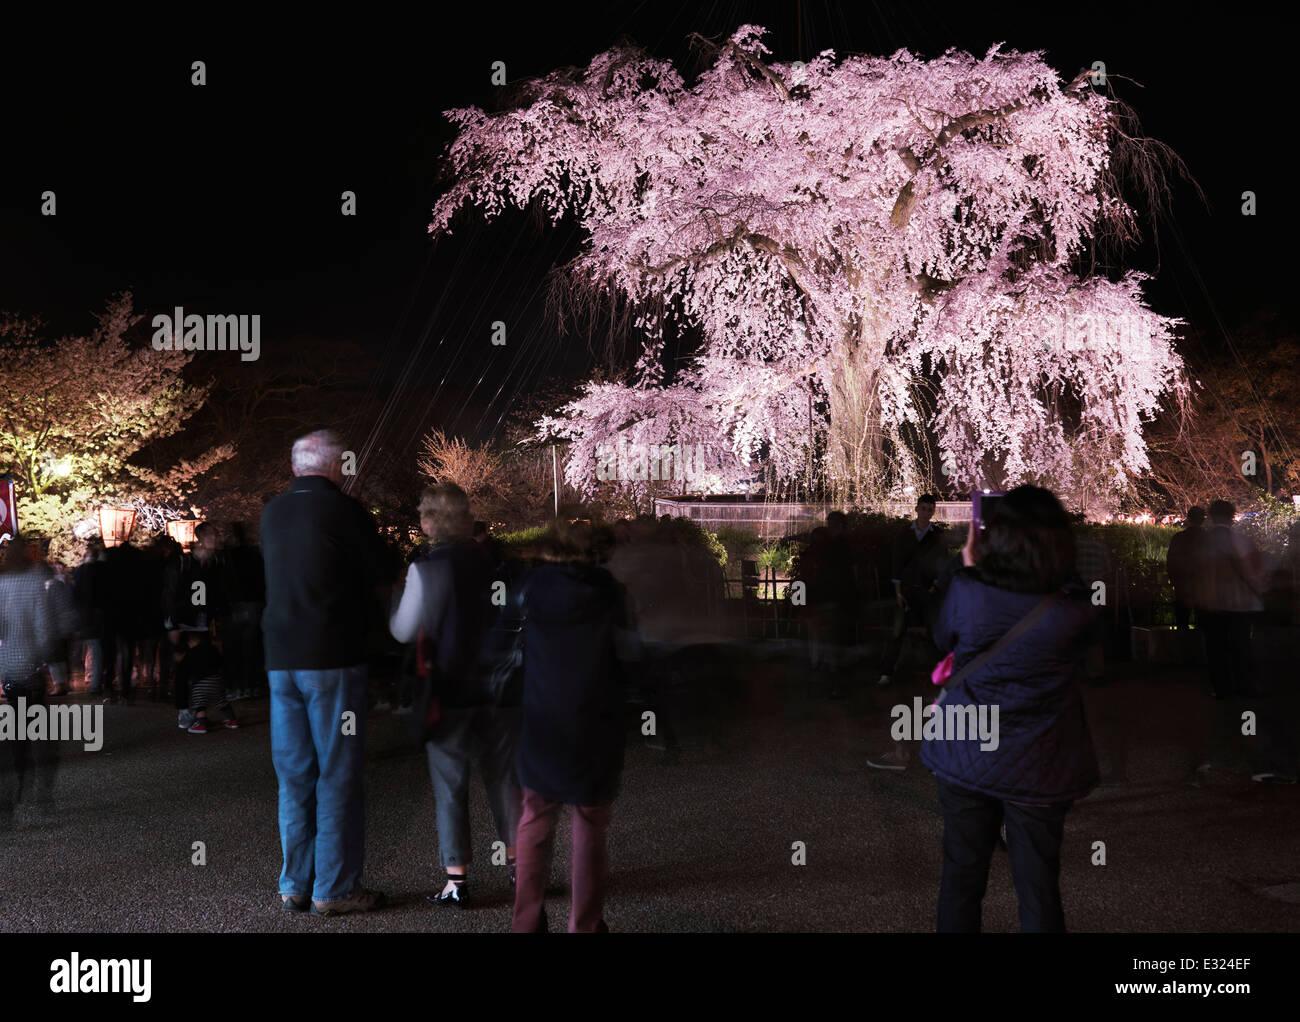 Weeping cherry tree, shidarezakura, lit up at night in Maruyama park, Gion, Kyoto, Japan 2014 - Stock Image